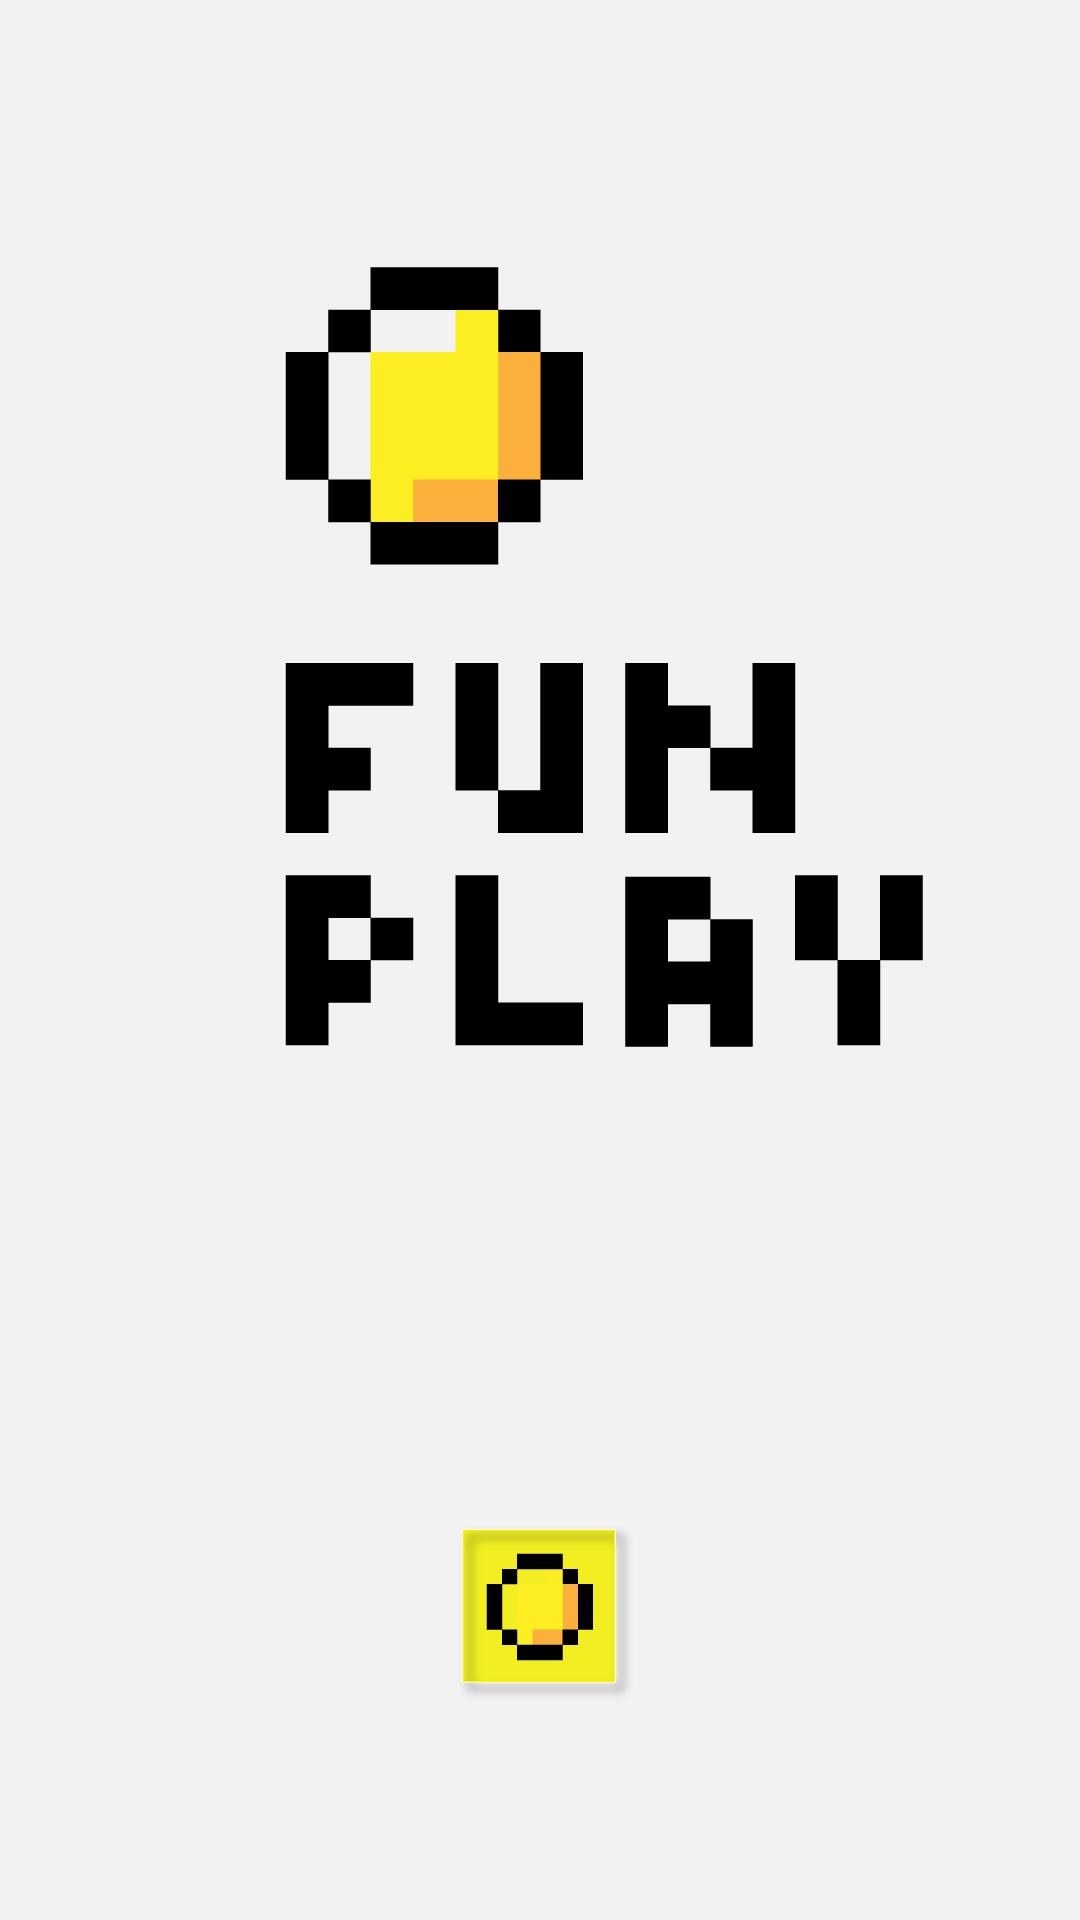 Логотип для FunPay.ru фото f_19759a06e0e30f5e.jpg